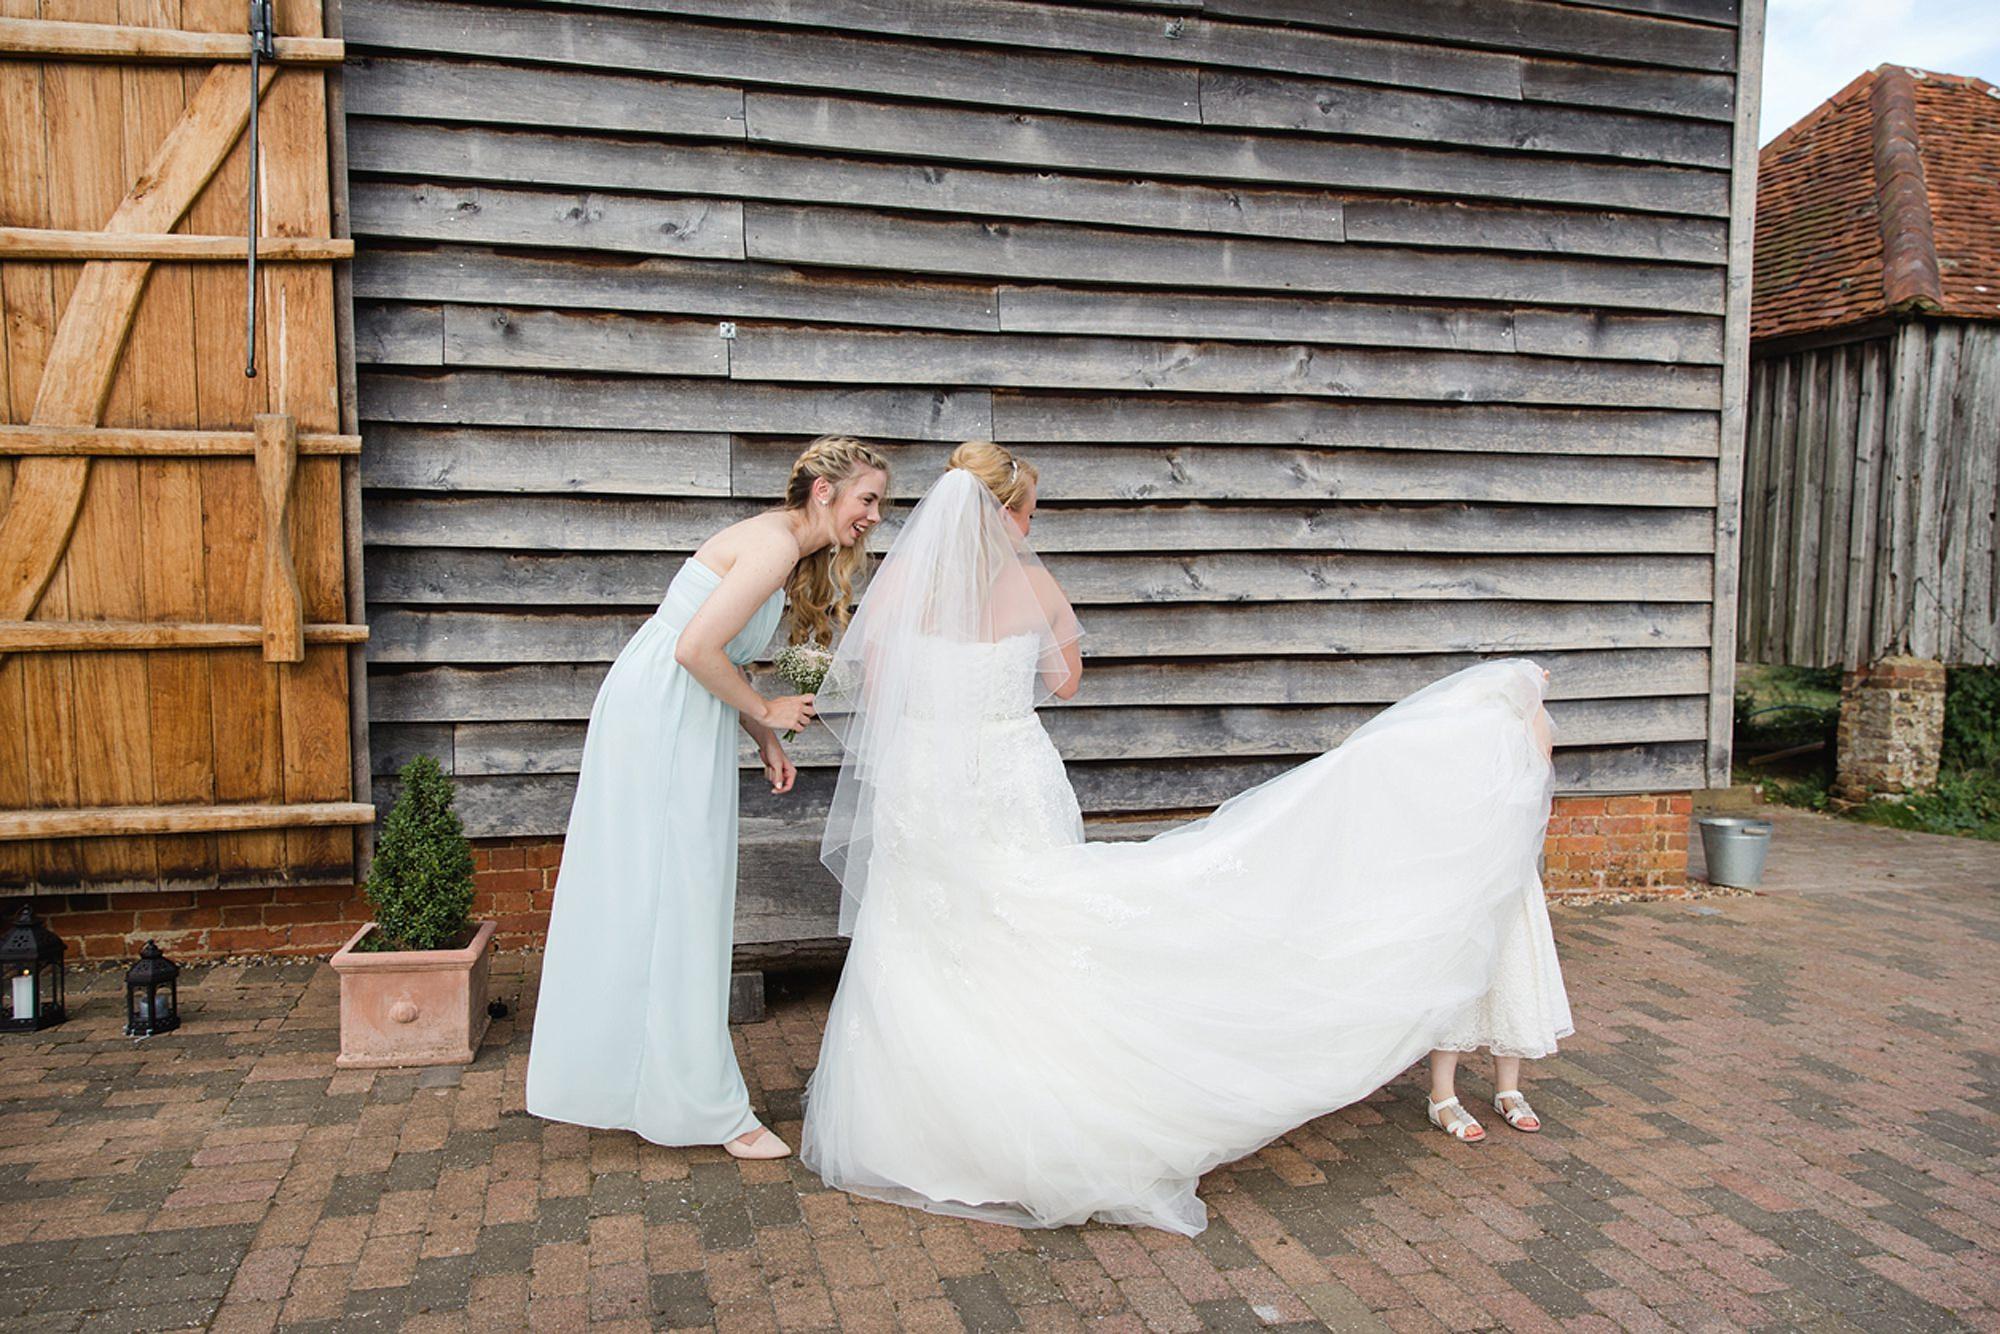 Old Greens Barn Newdigate wedding photography flower girl under dress